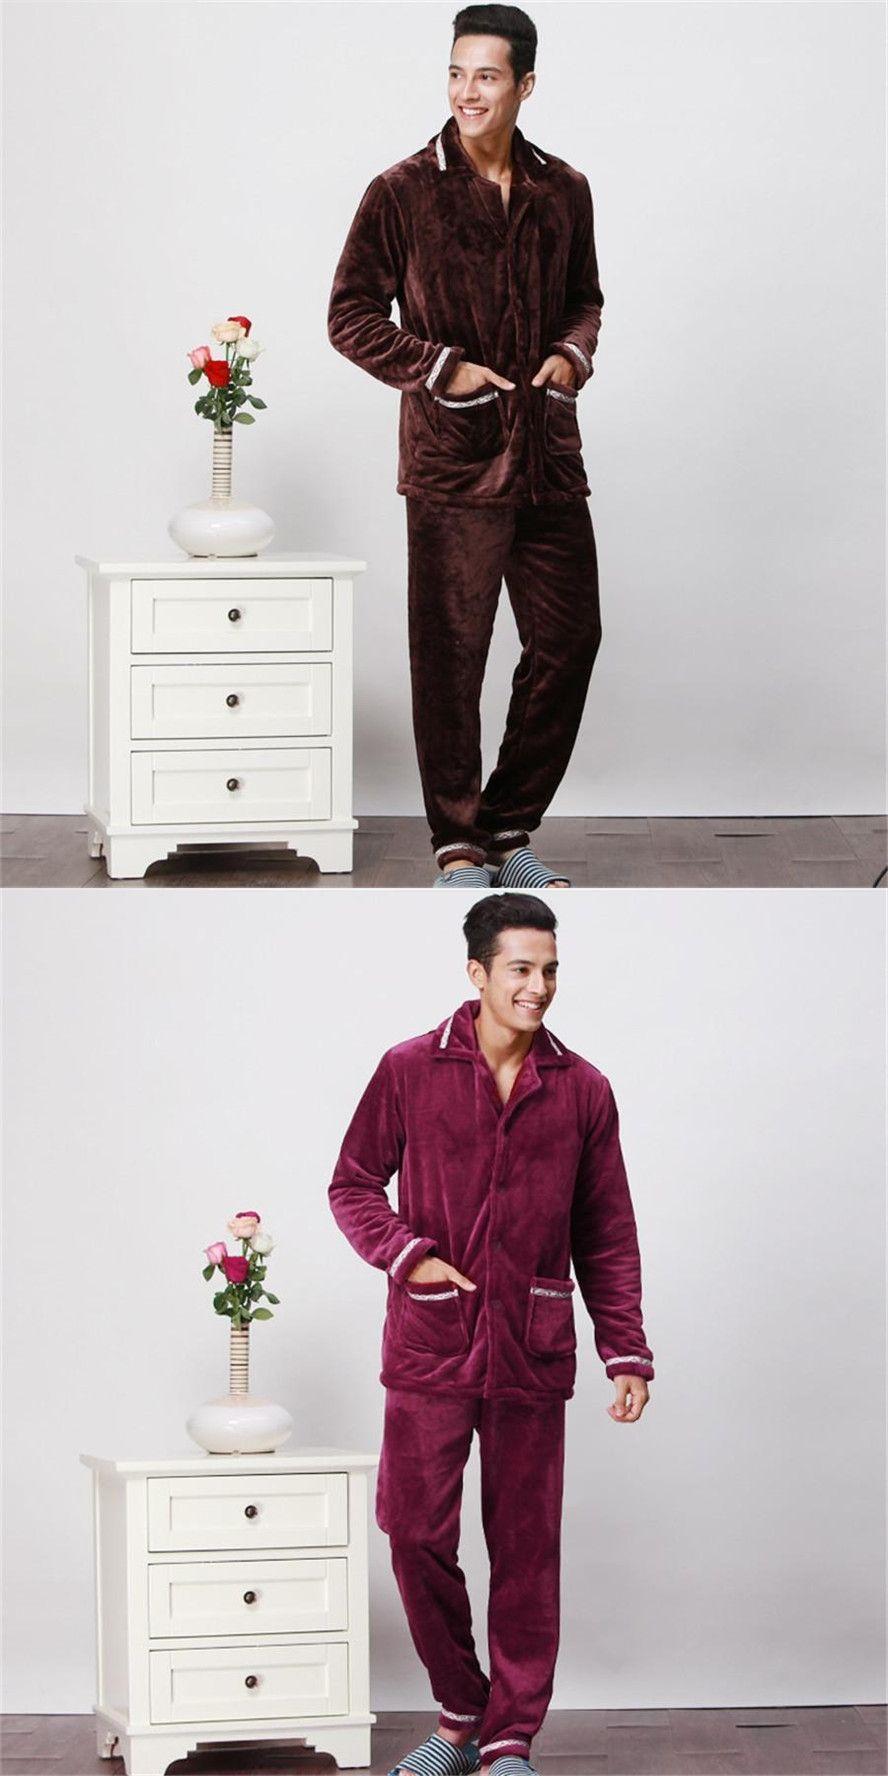 dbf7e7962494 ROSICIL Winter Men s Pajamas Thickening Warm Mens Pyjama Sets Lounge Wear  Comfortable Coral Fleece Male Sleepwear